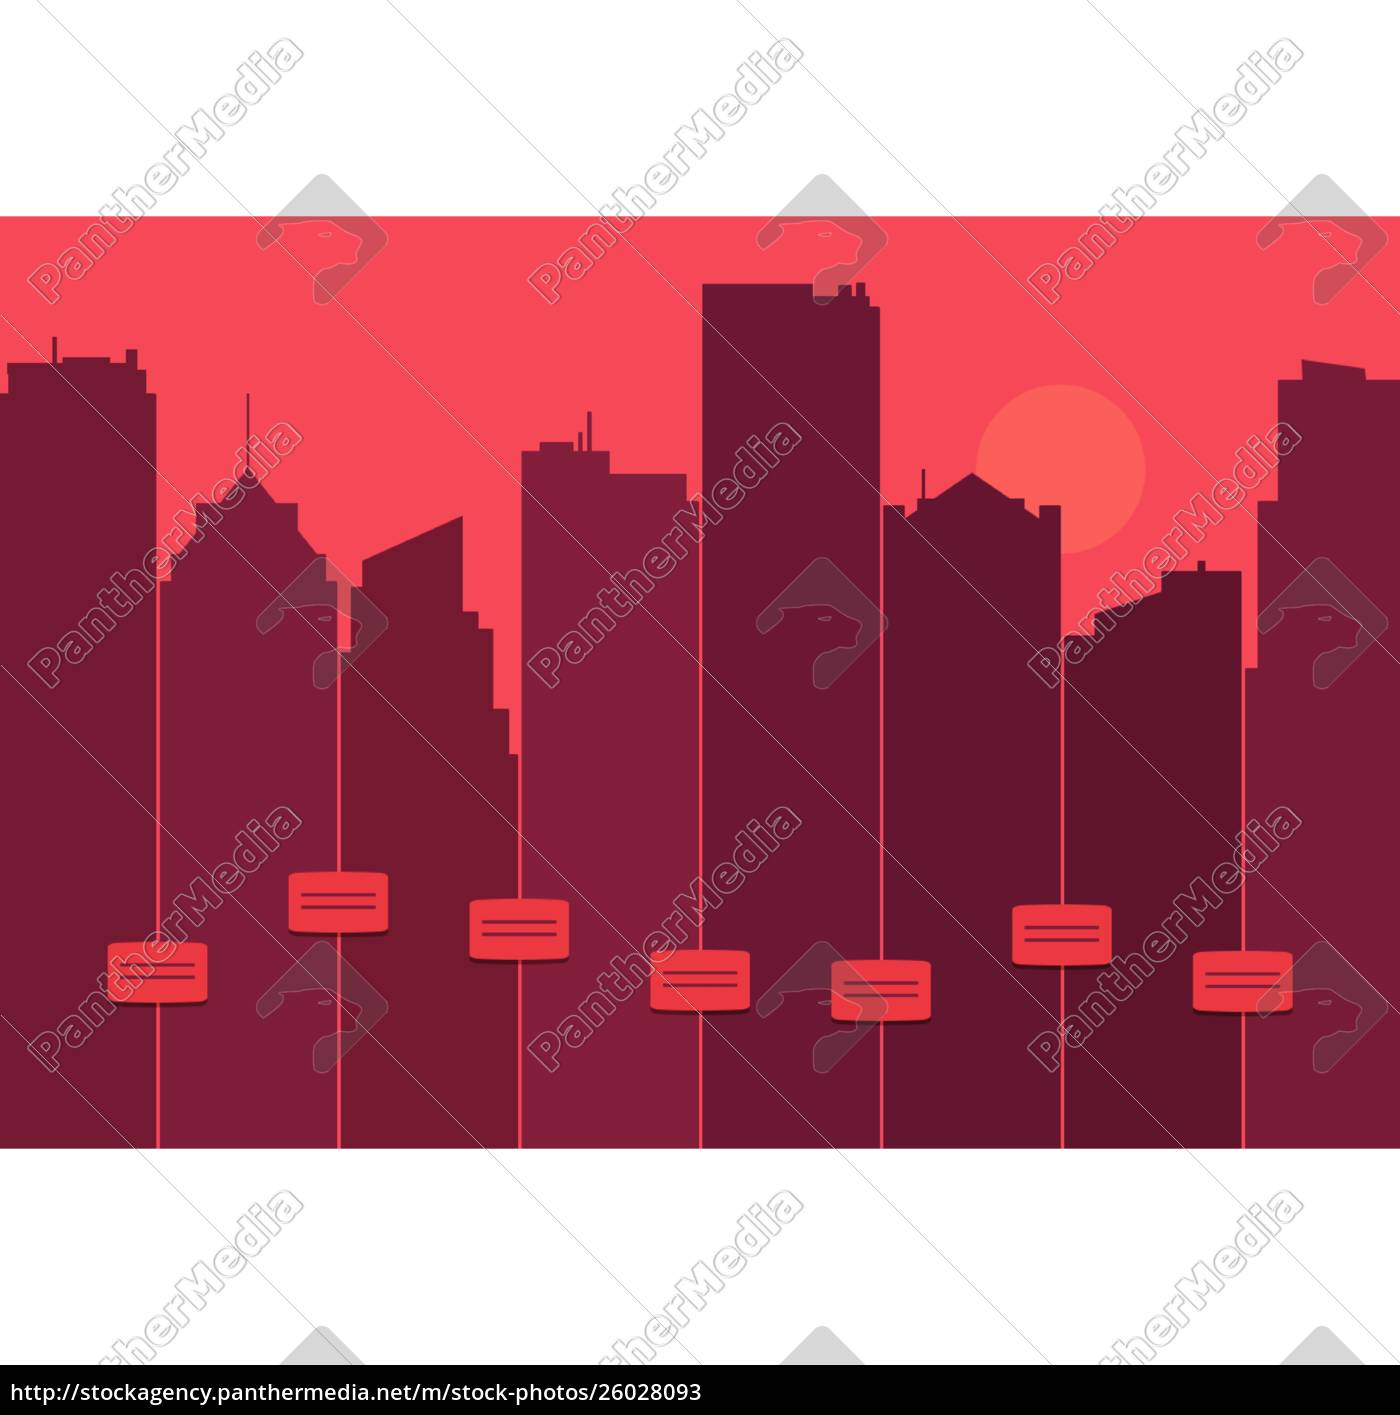 silhouette, of, a, city, skyline - 26028093